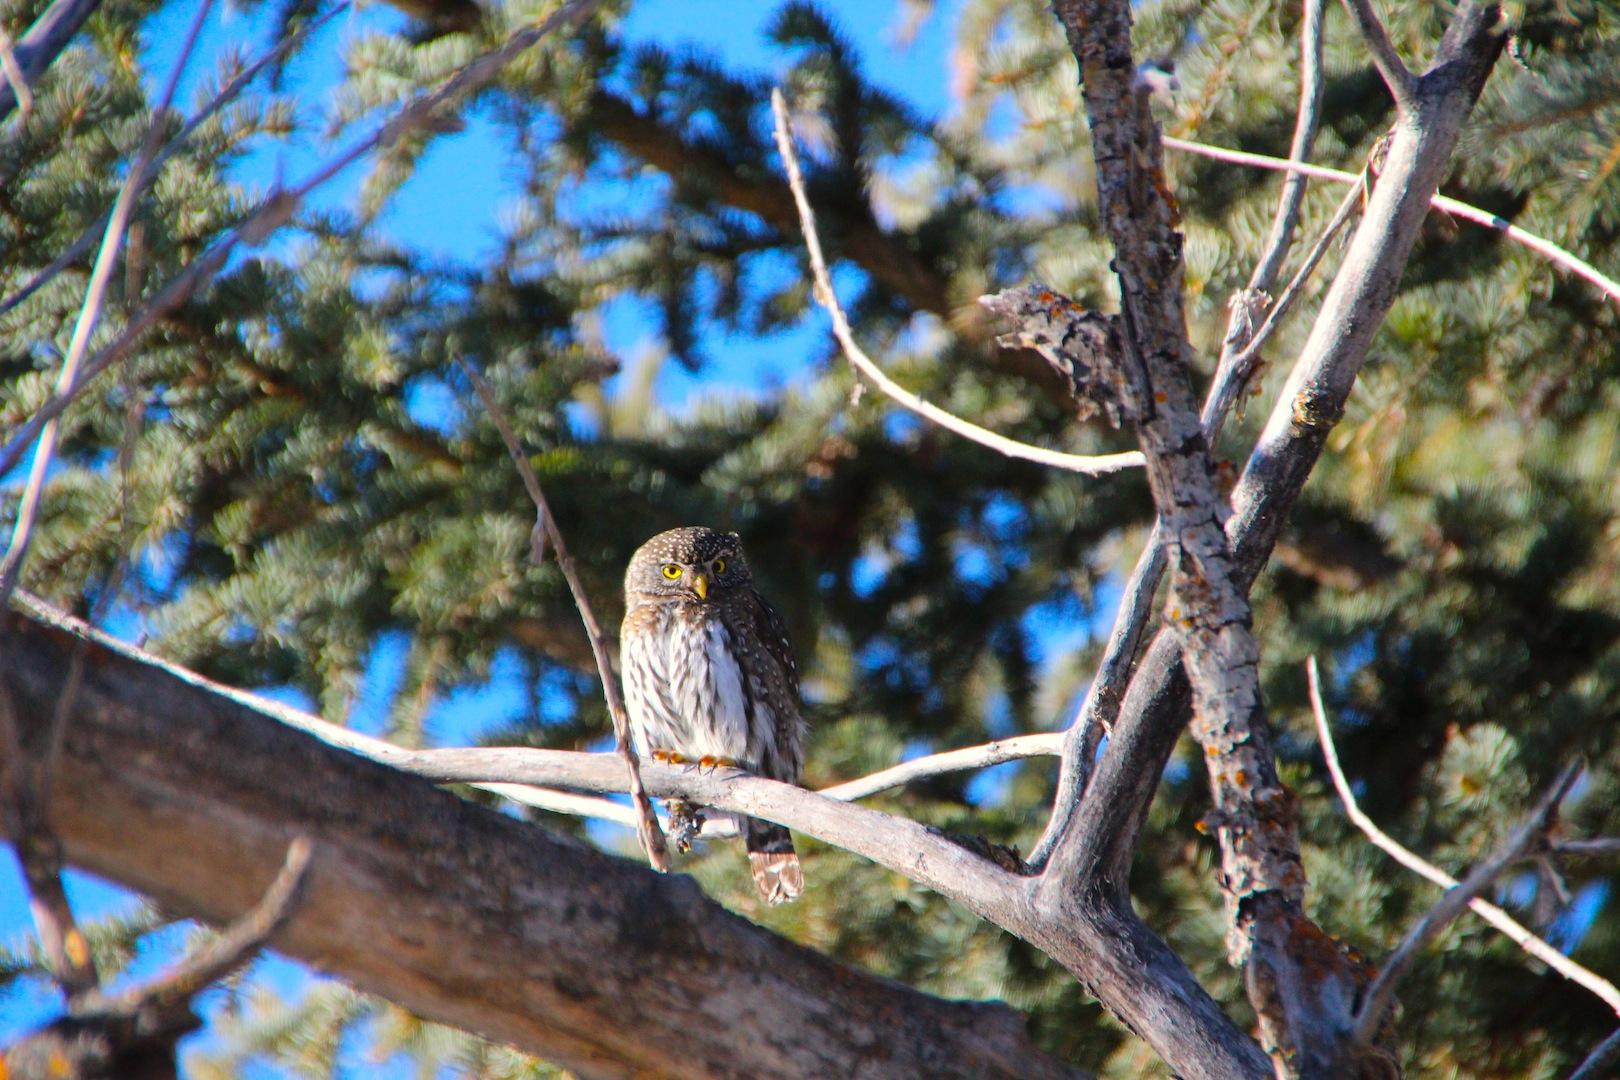 008 - Northern Pygmy Owl